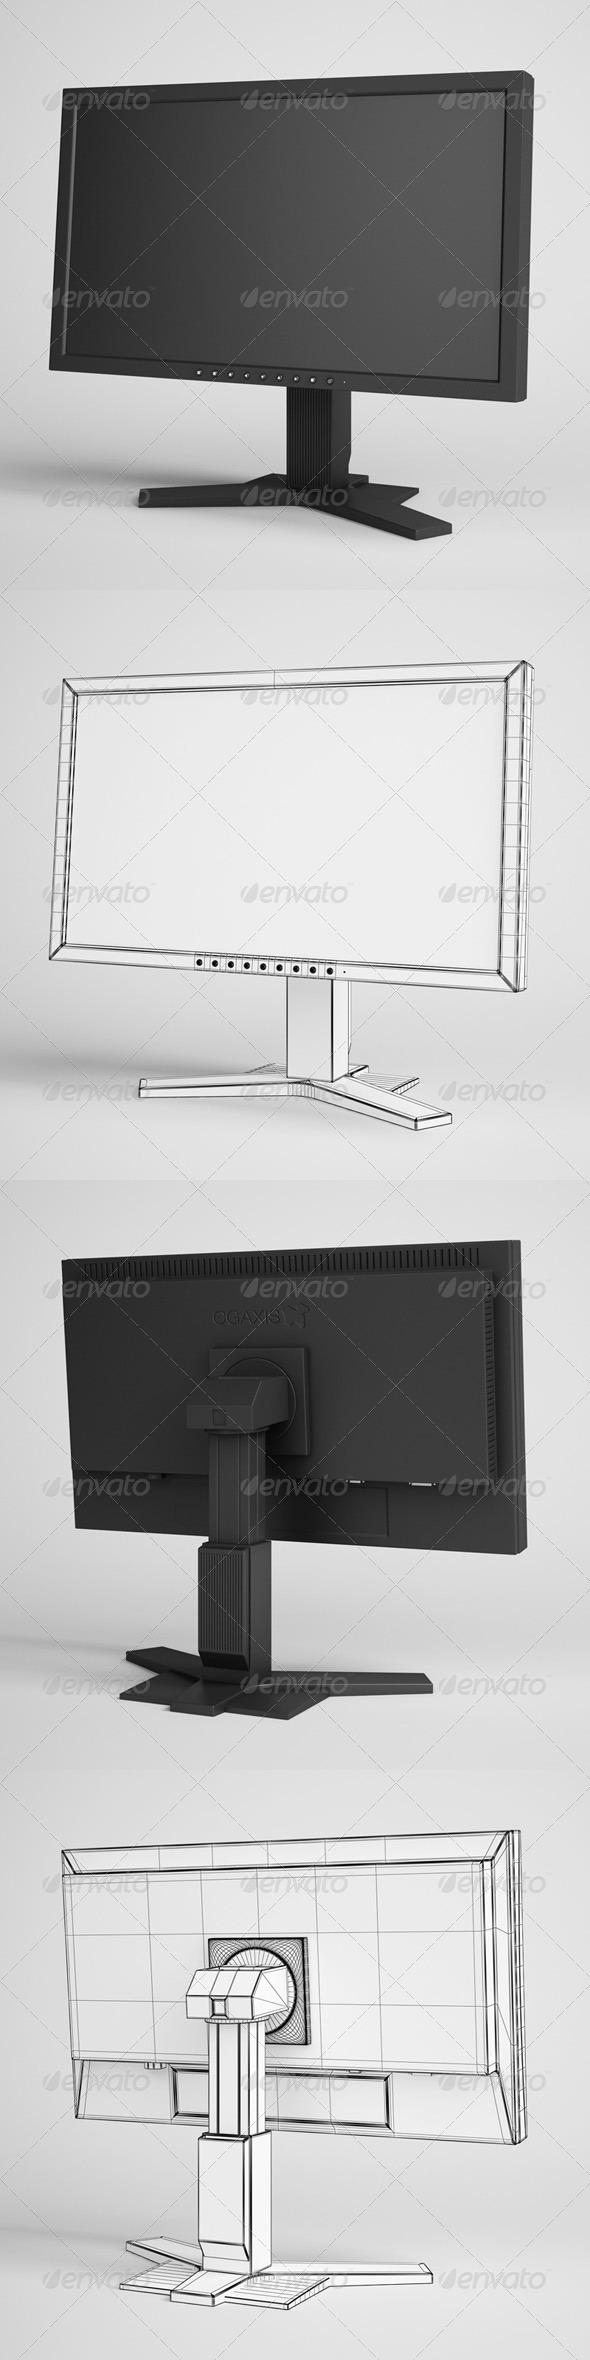 3DOcean CGAxis Flatscreen Monitor Electronics 20 166336